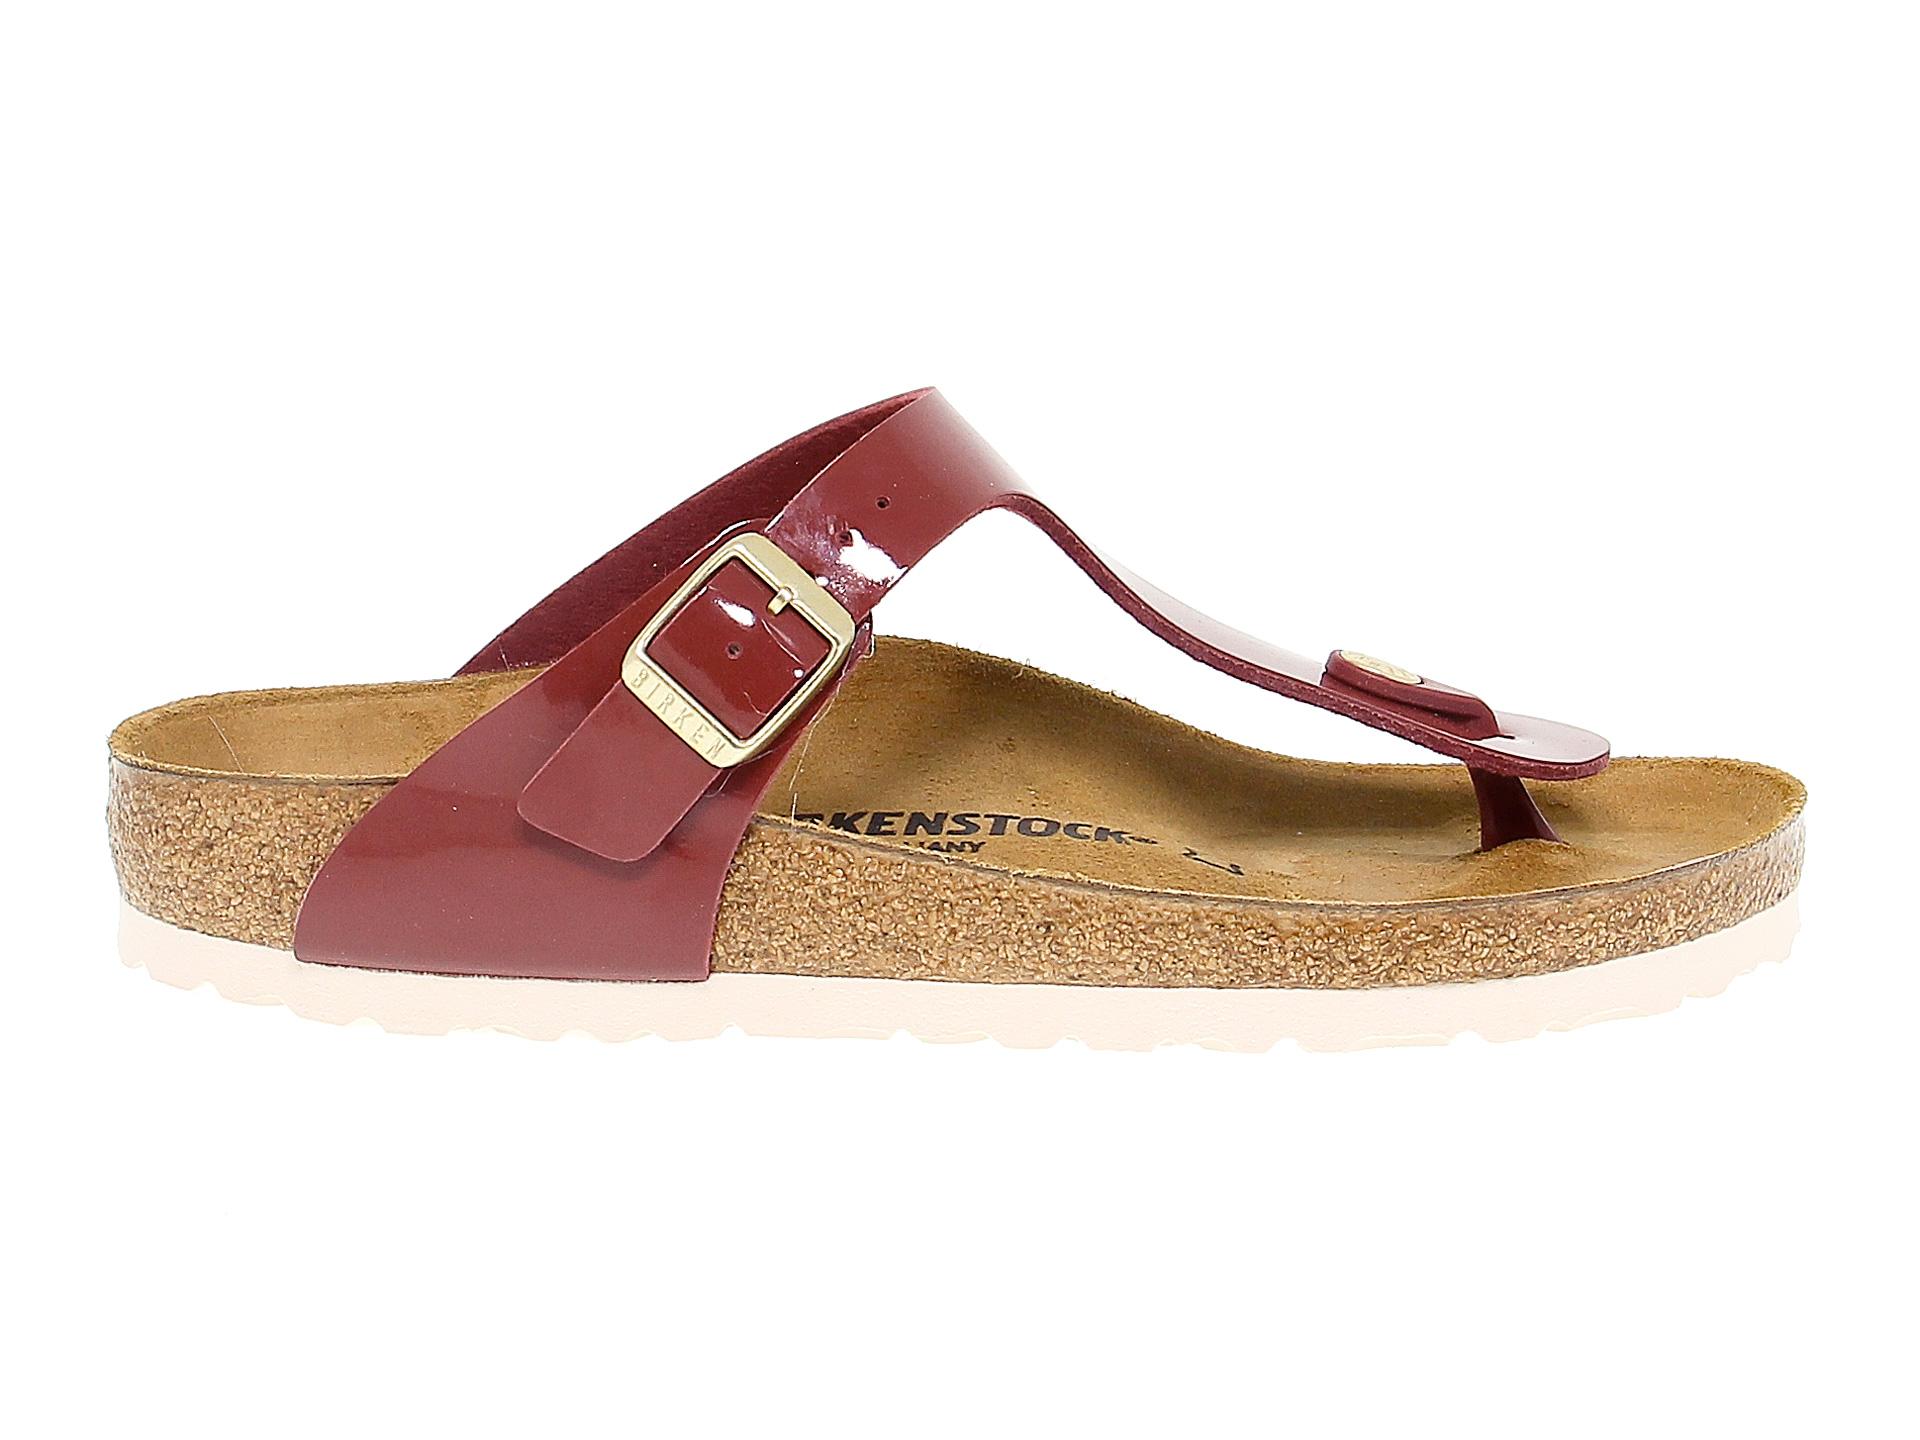 Details about Flat sandals BIRKENSTOCK 1013073 in bordeaux birkoflor Women's Shoes